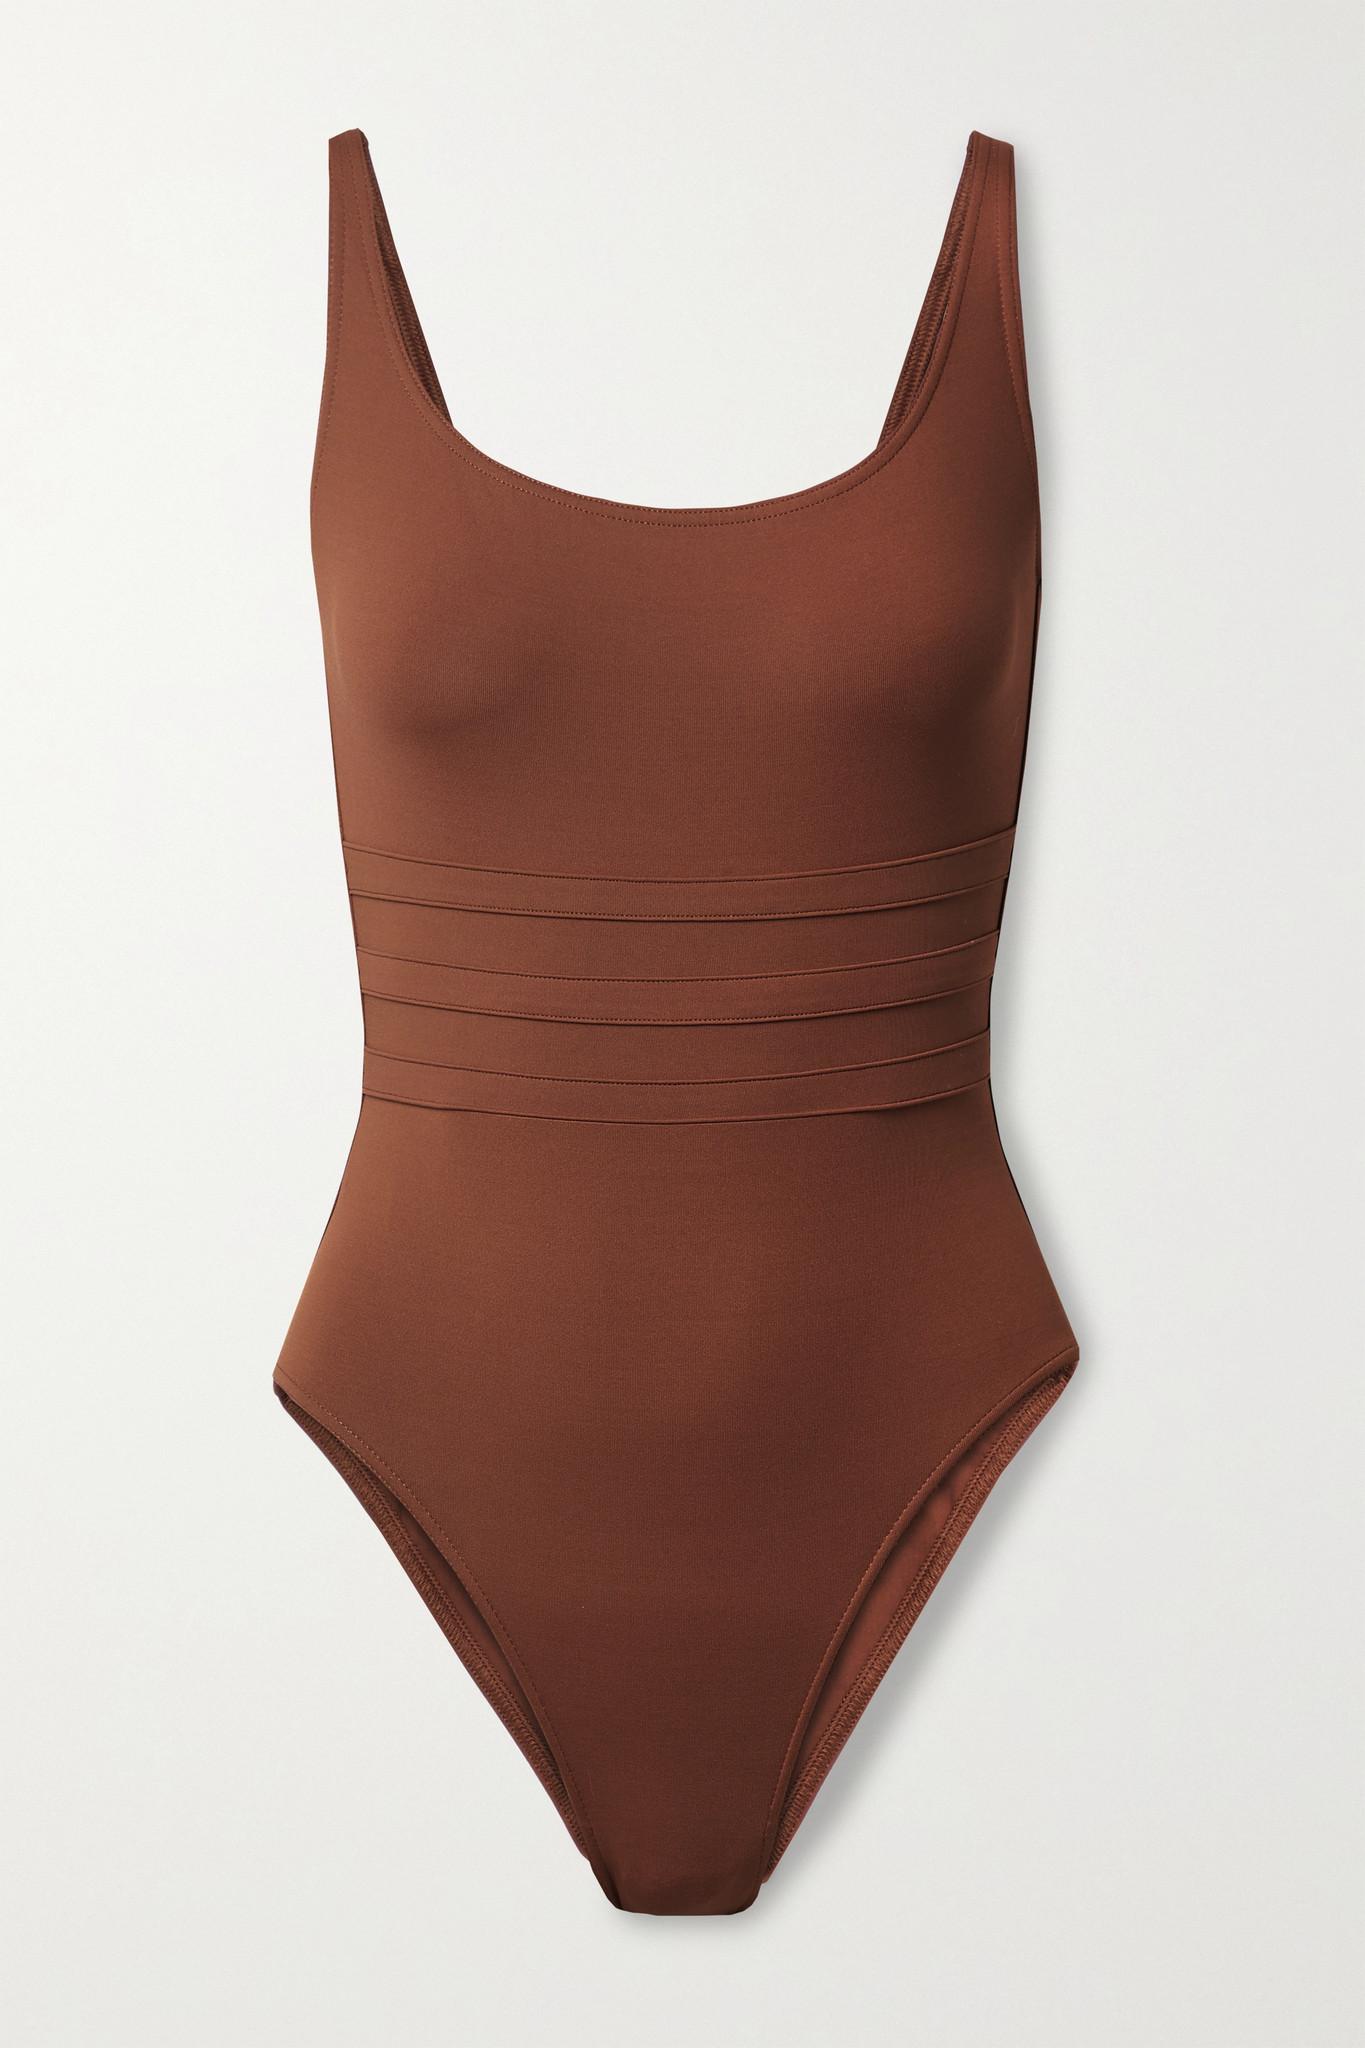 ERES - Les Essentials Asia Swimsuit - Brown - FR42